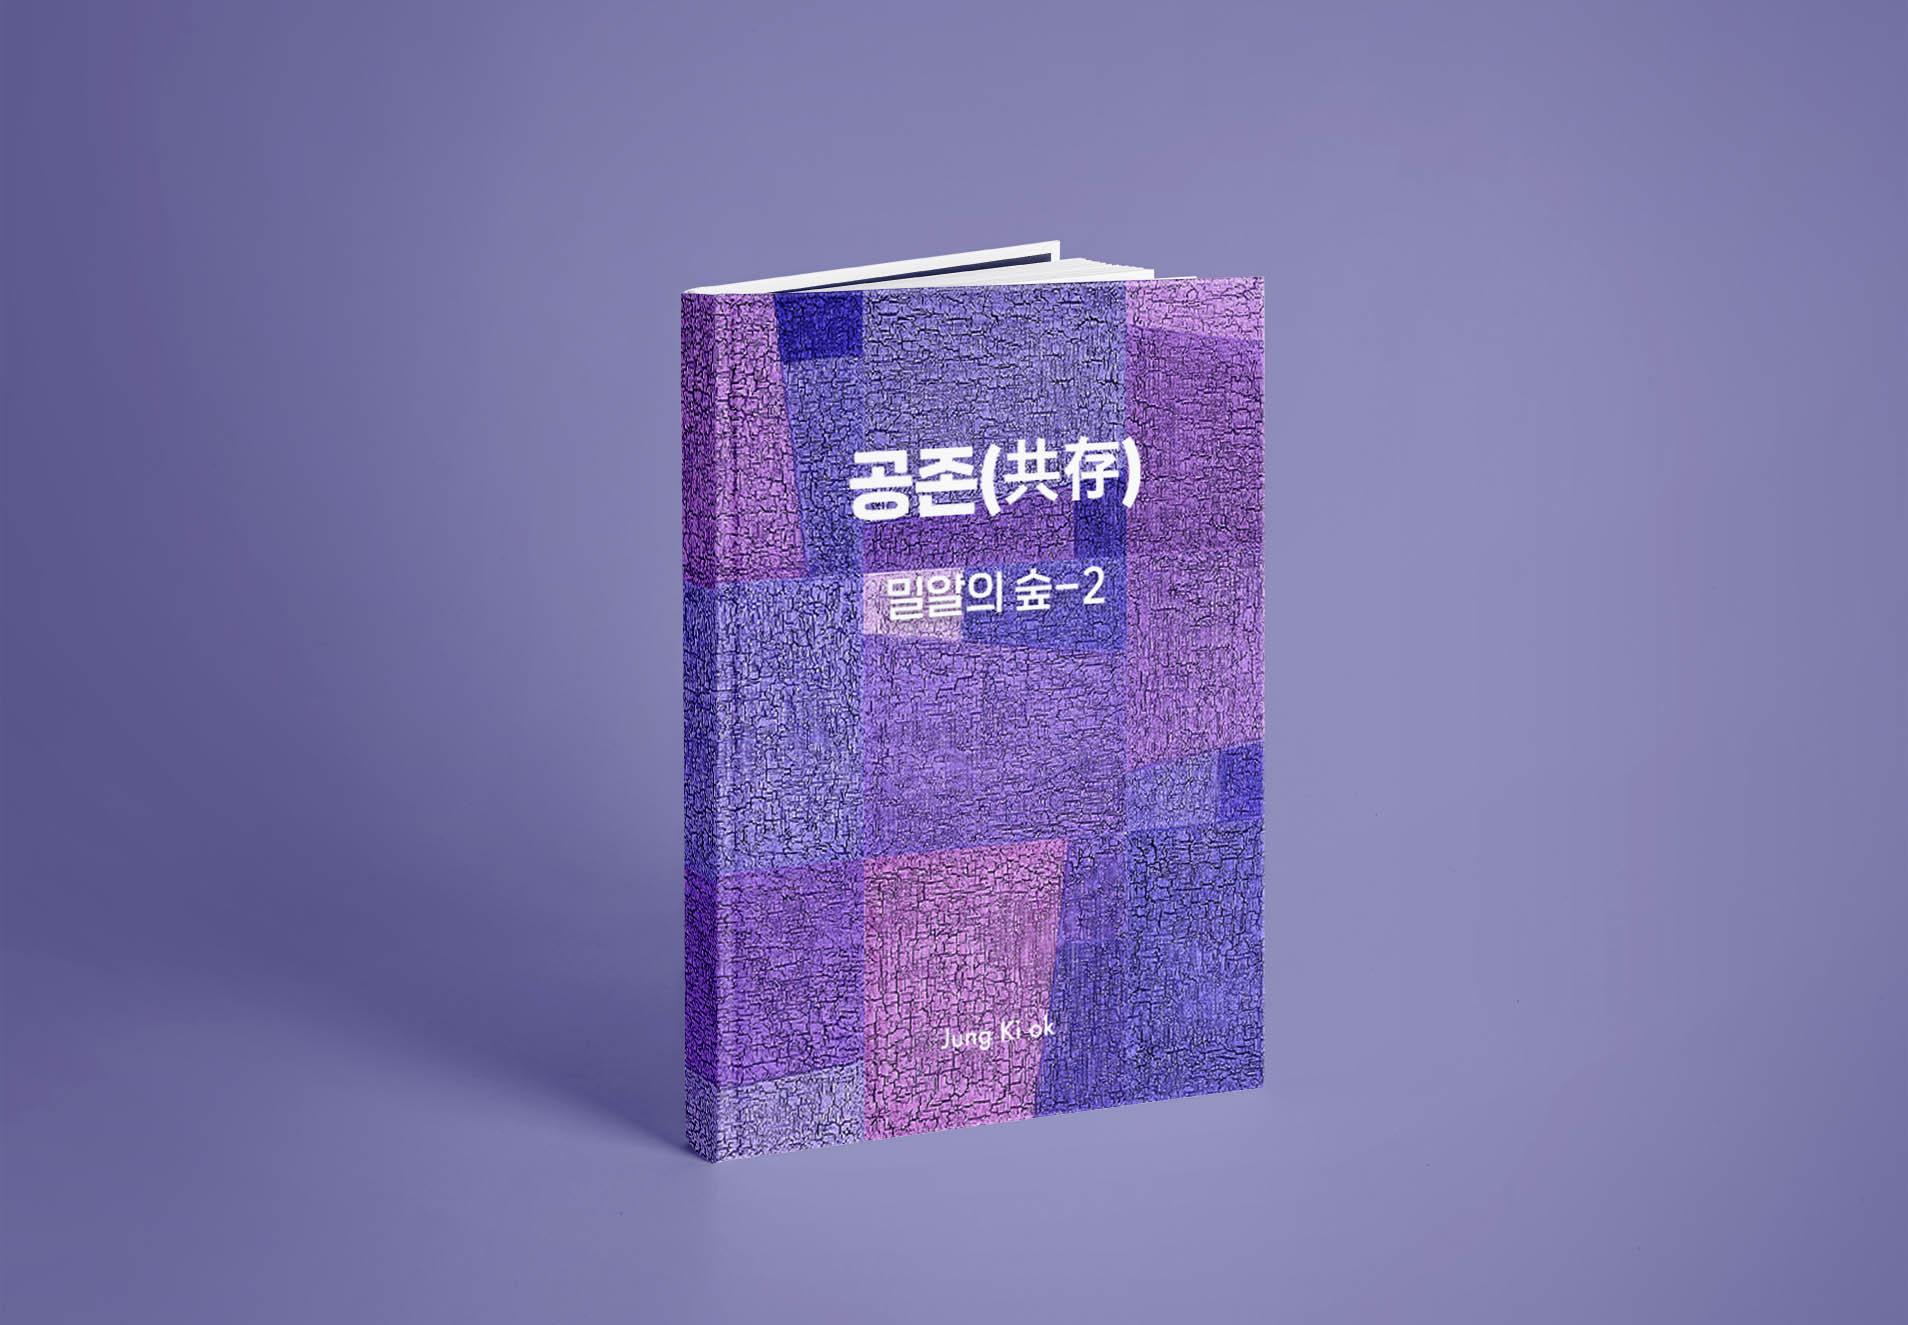 Kiok. Jeong <공존 - 밀알의 숲> 시즌2